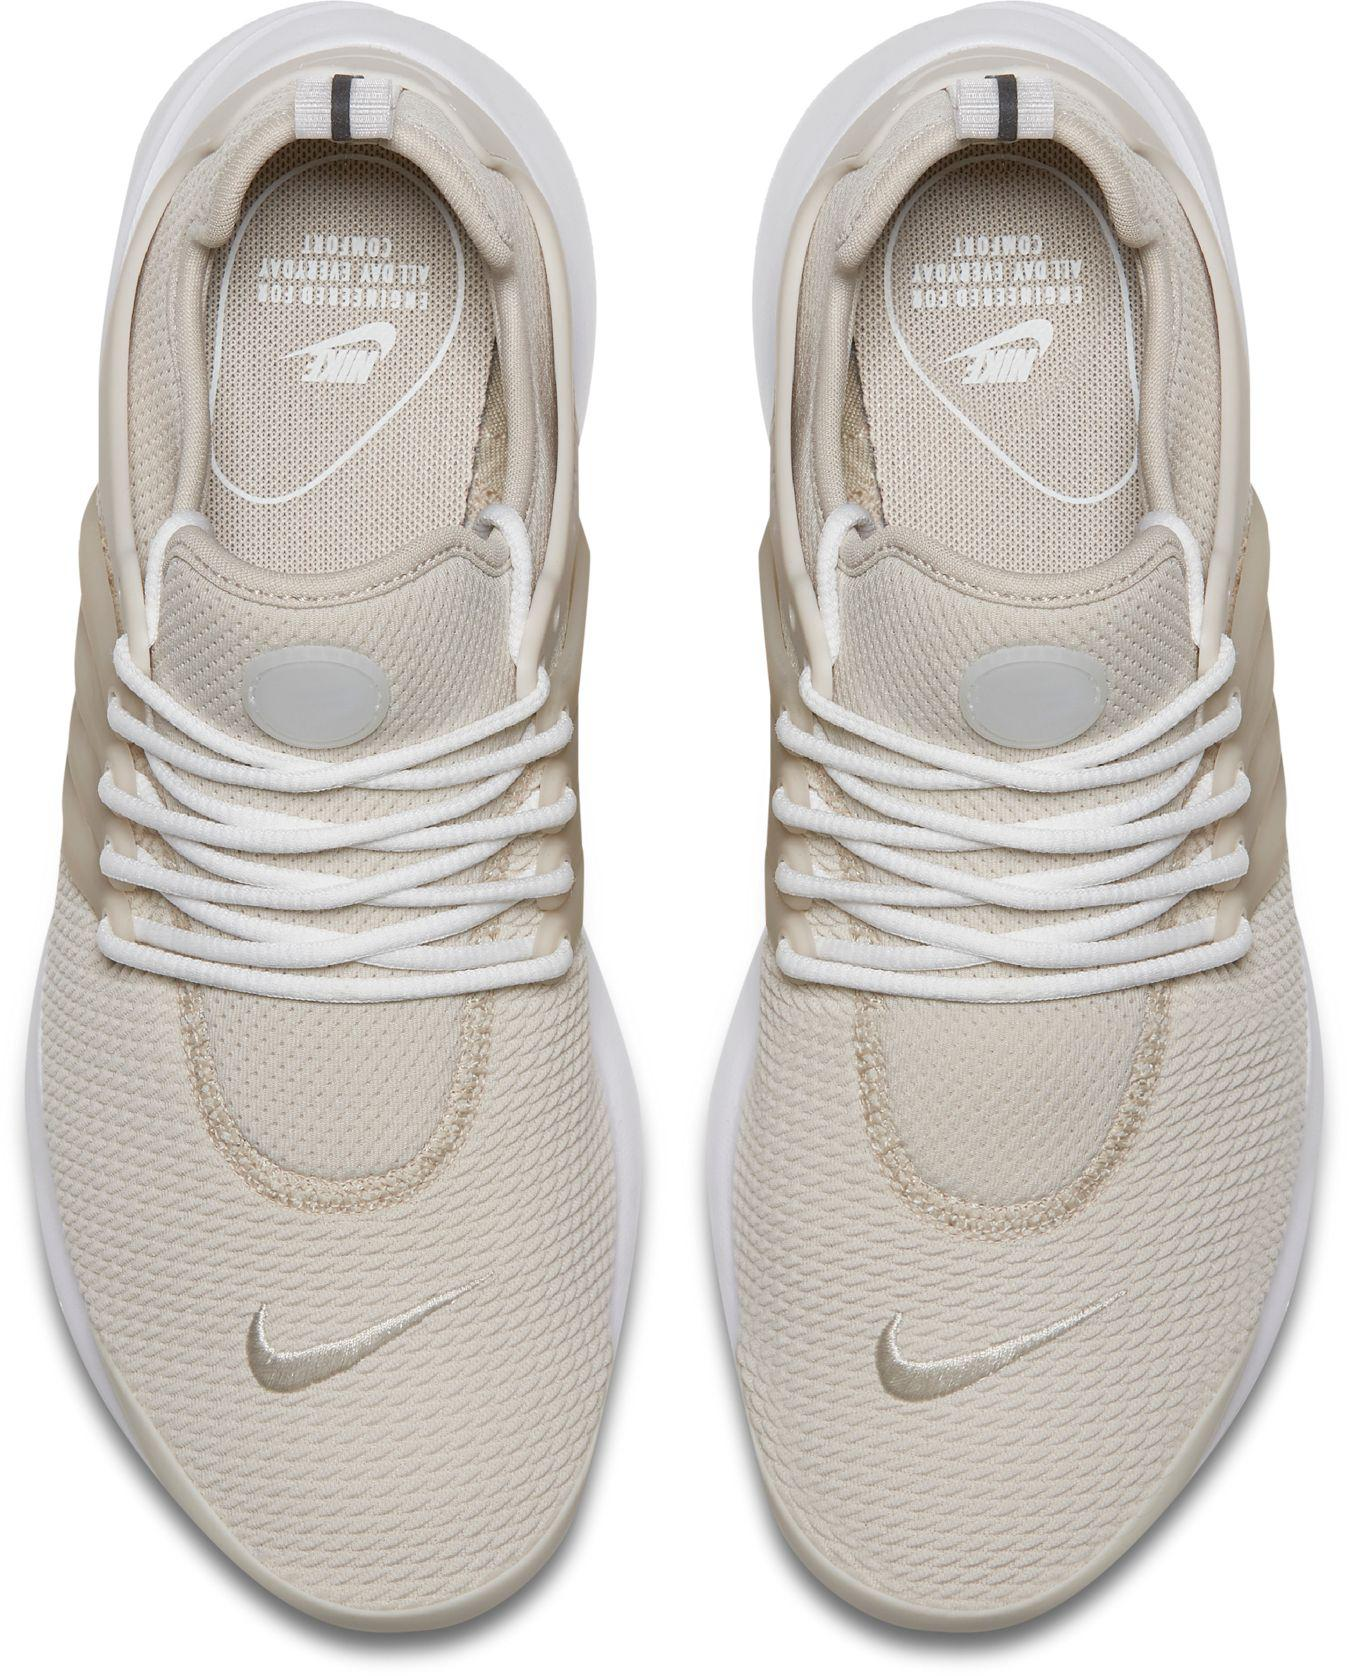 Nike - Multicolor Air Presto Shoes - Lyst 1b031438f515